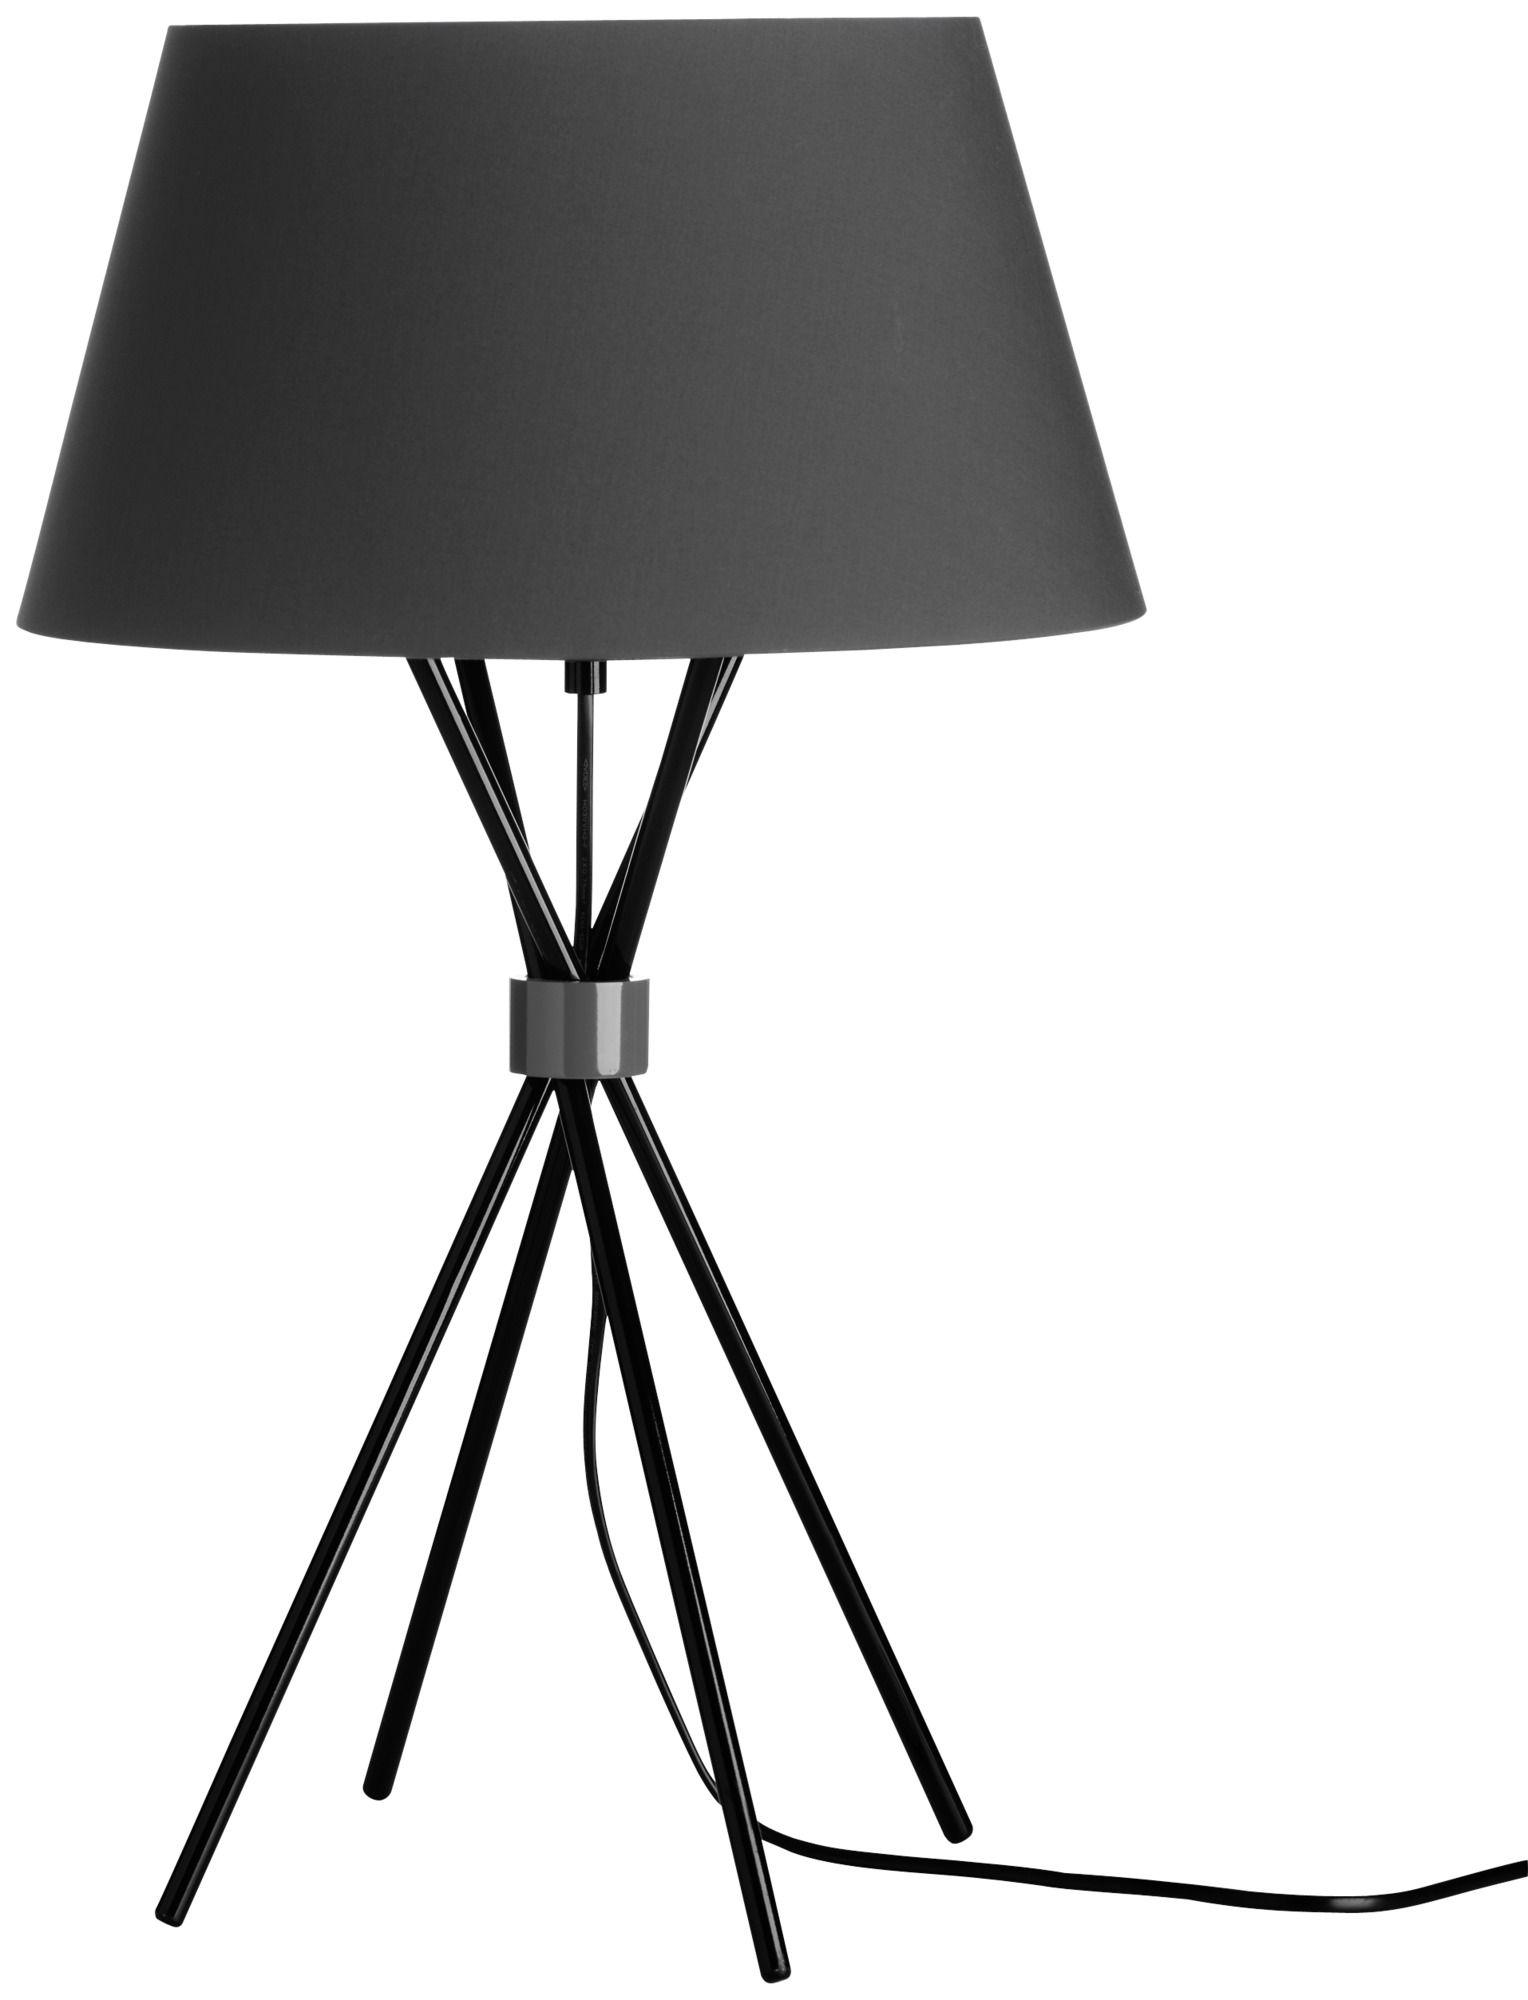 Moderne Designer Lampen online kaufen   BoConcept®   Lamp, Modern table lamp, Wall lamp